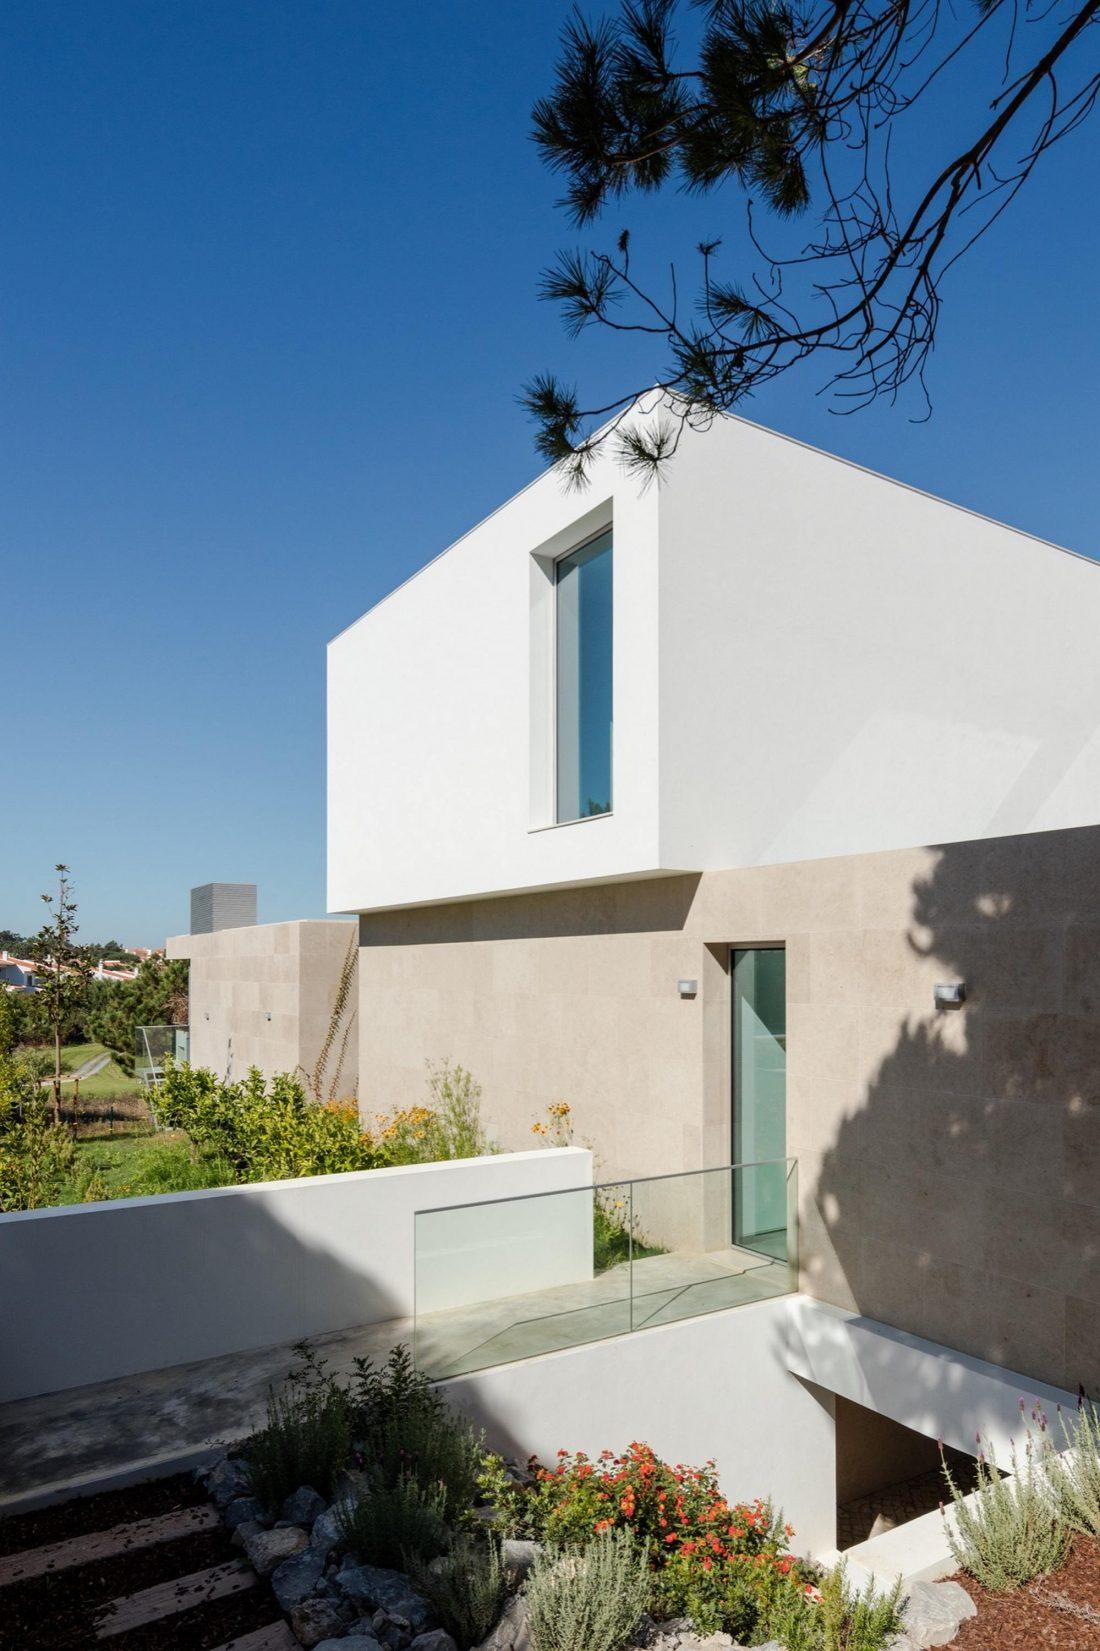 Дом в Обидуше, Португалия, от студии RSM arquitecto и Russell Jones Architects 4